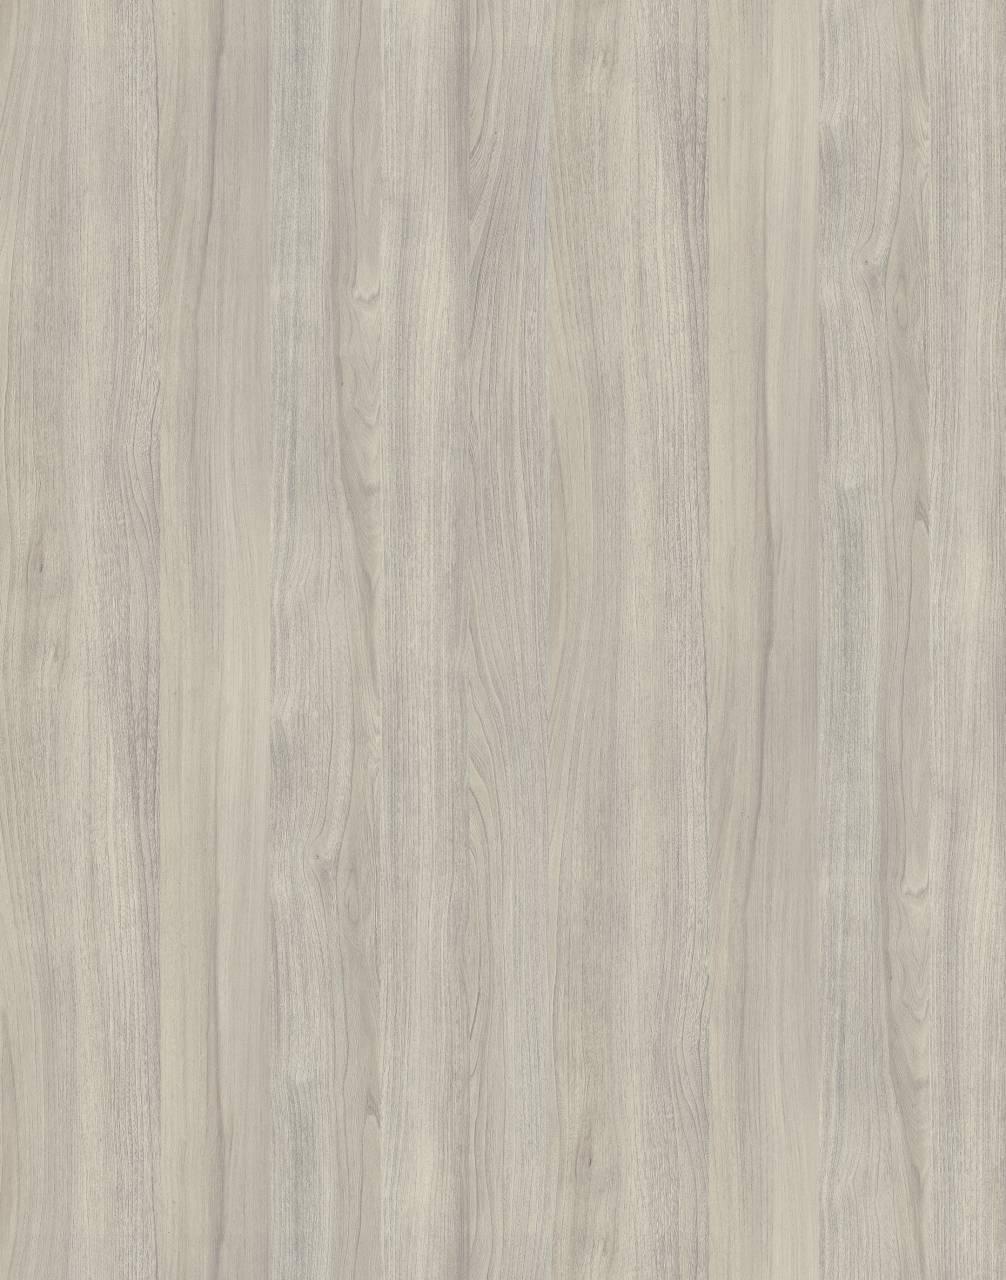 K019 Silver Liberty Elm (MF PB sample)